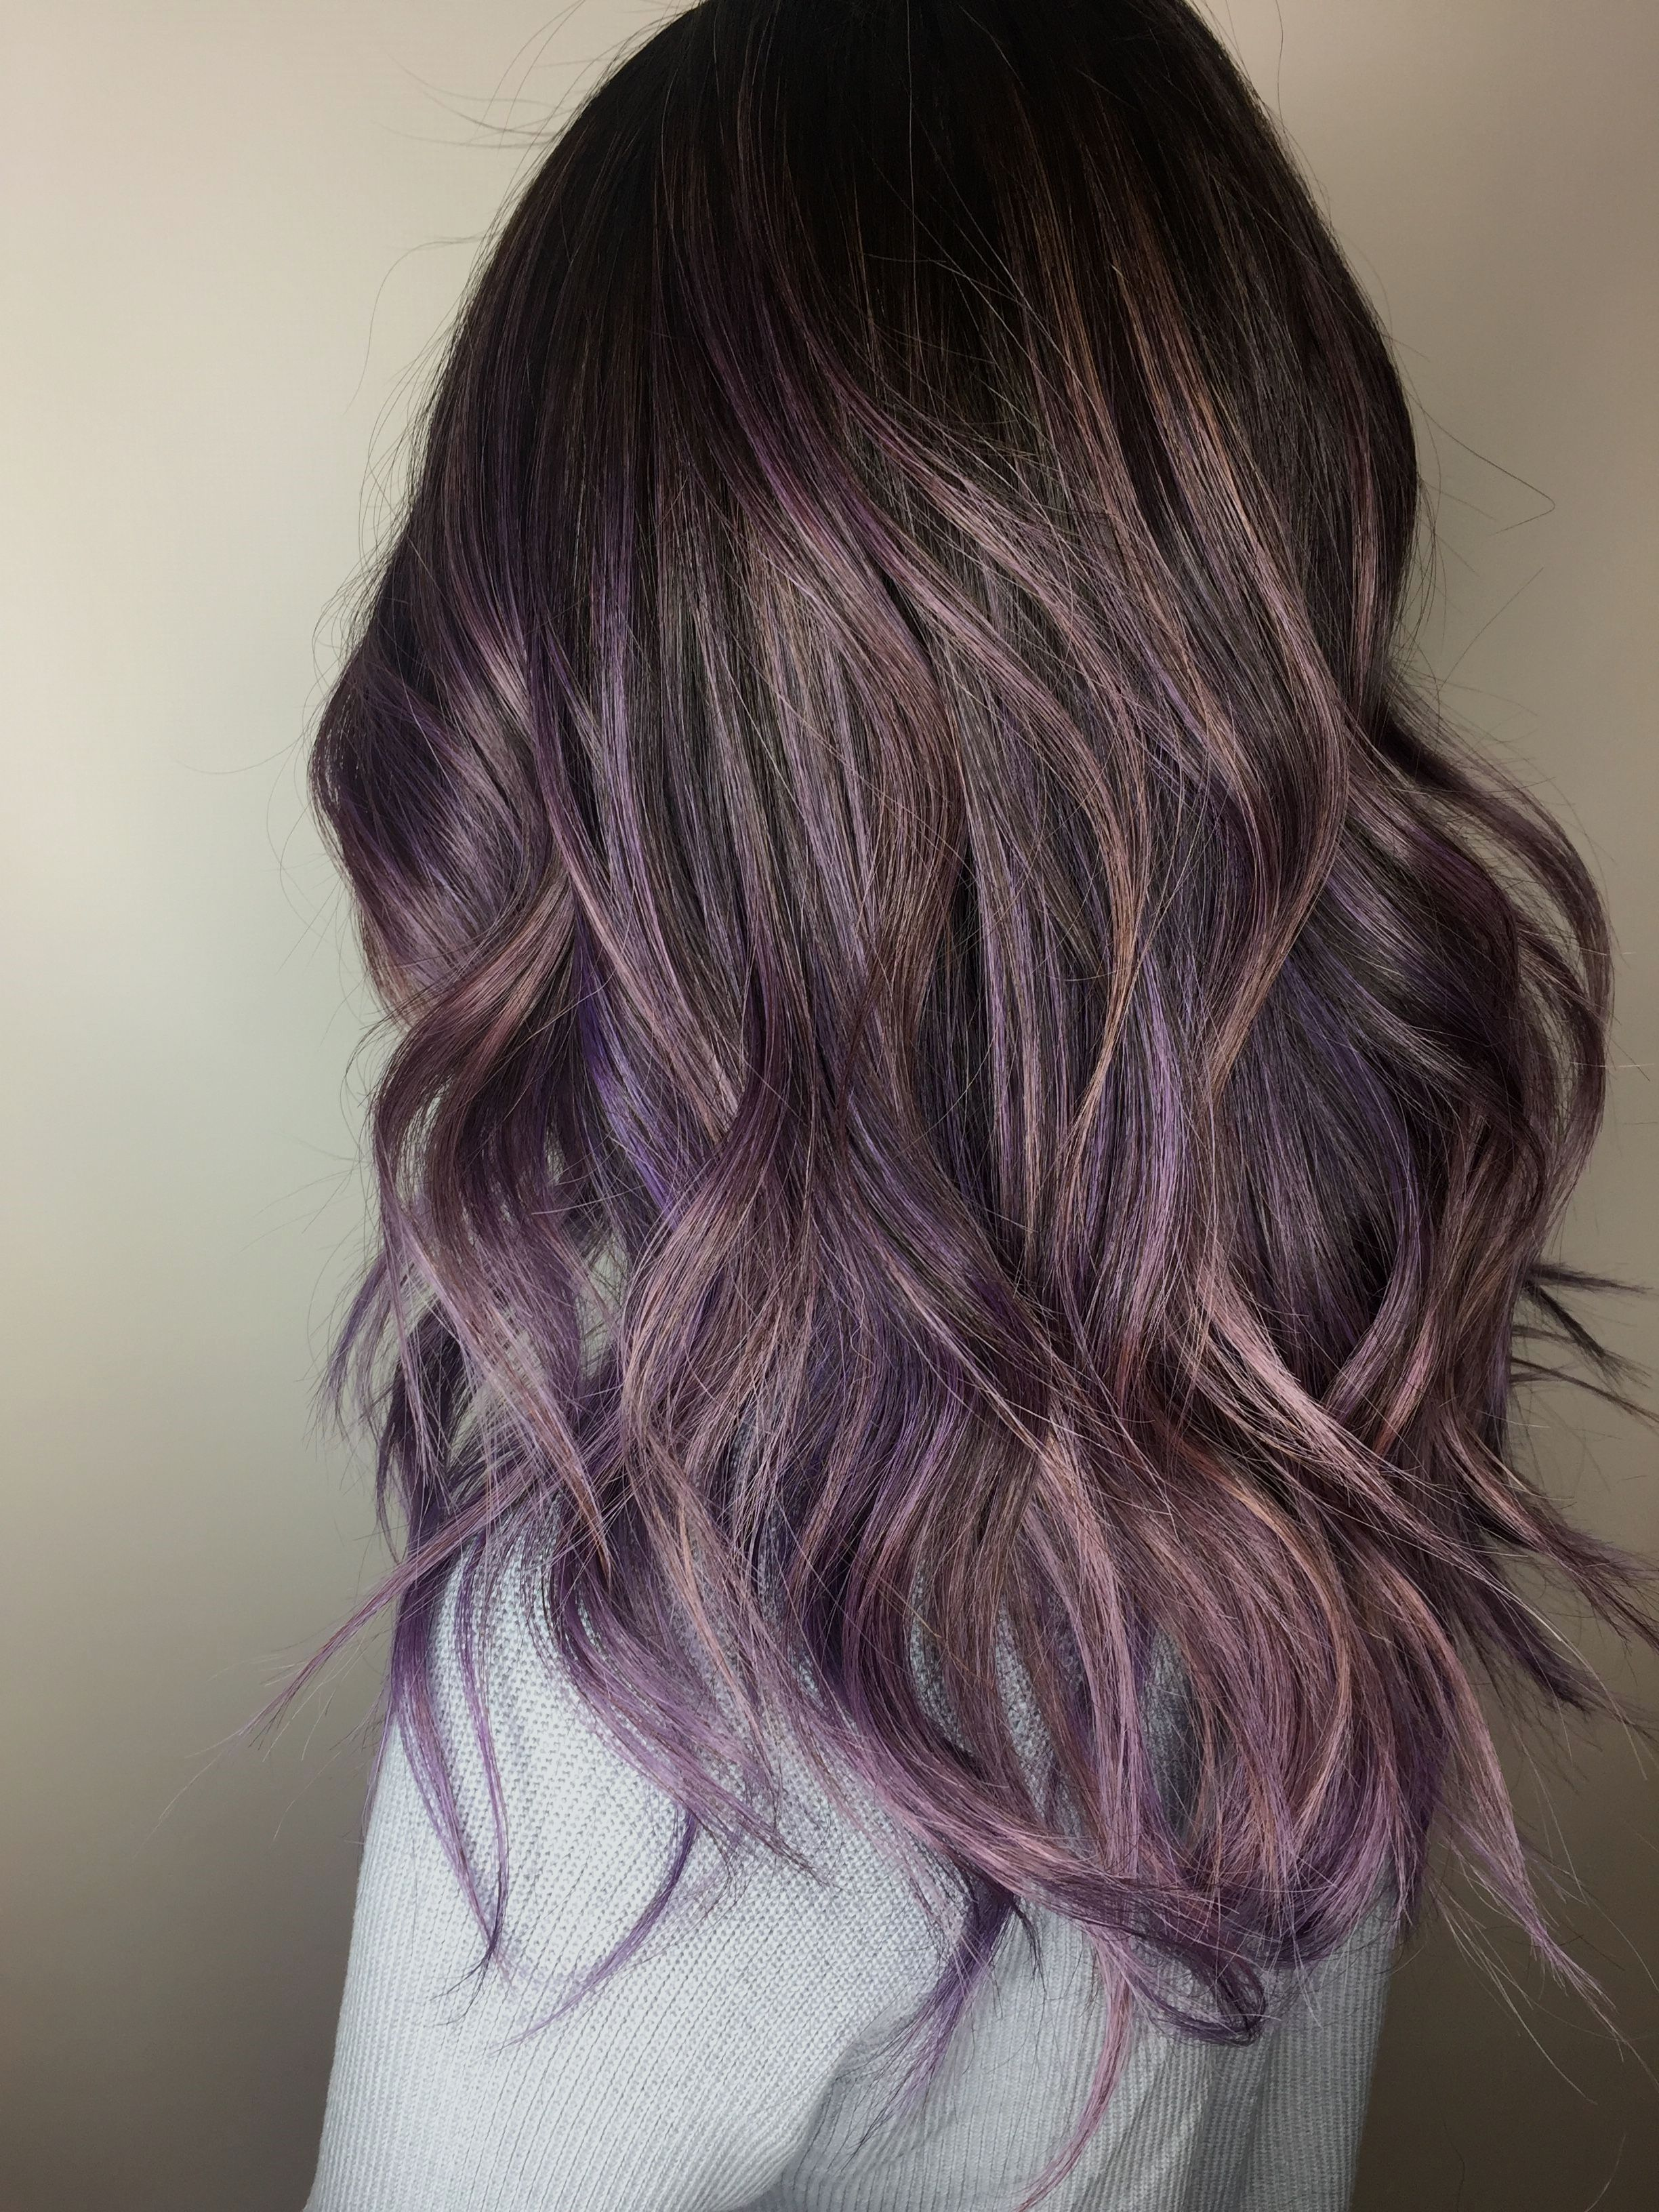 Pin By Farra Adriana On Hair Hair Styles Purple Hair Balayage Hair